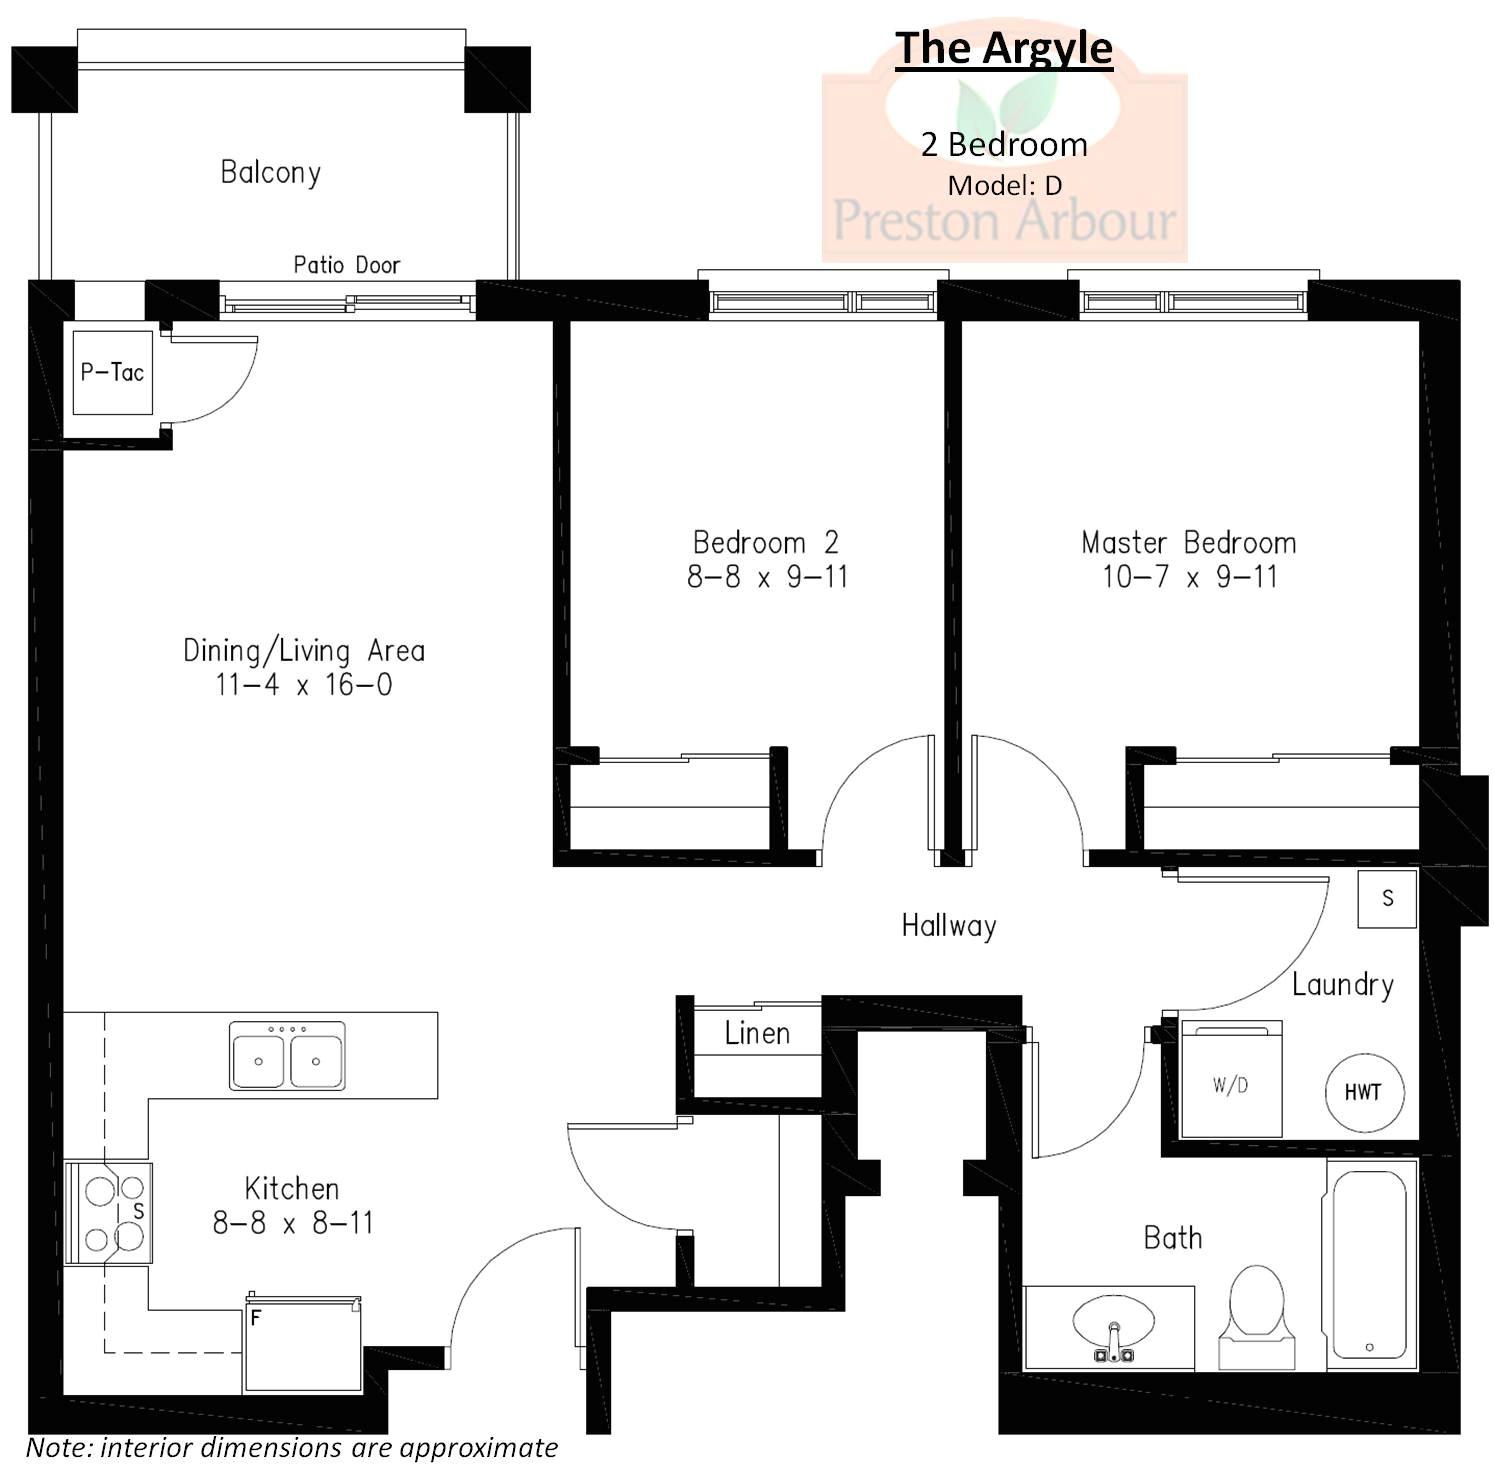 Online Home Plan Maker Architecture Free Online Floor Plan Maker Images Floor